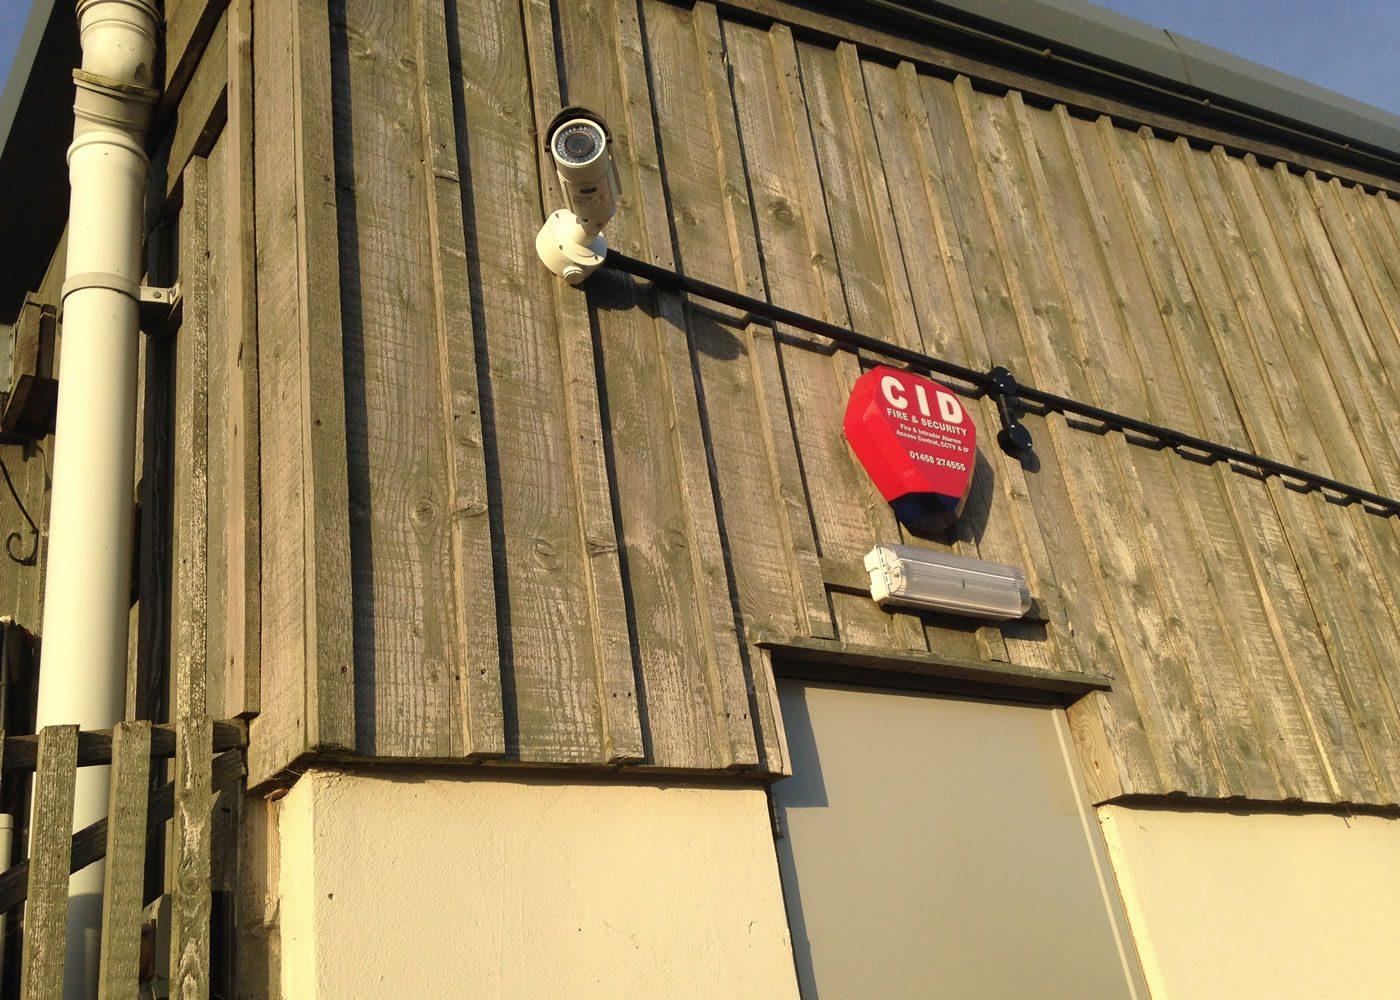 intruder-burglar-alarms